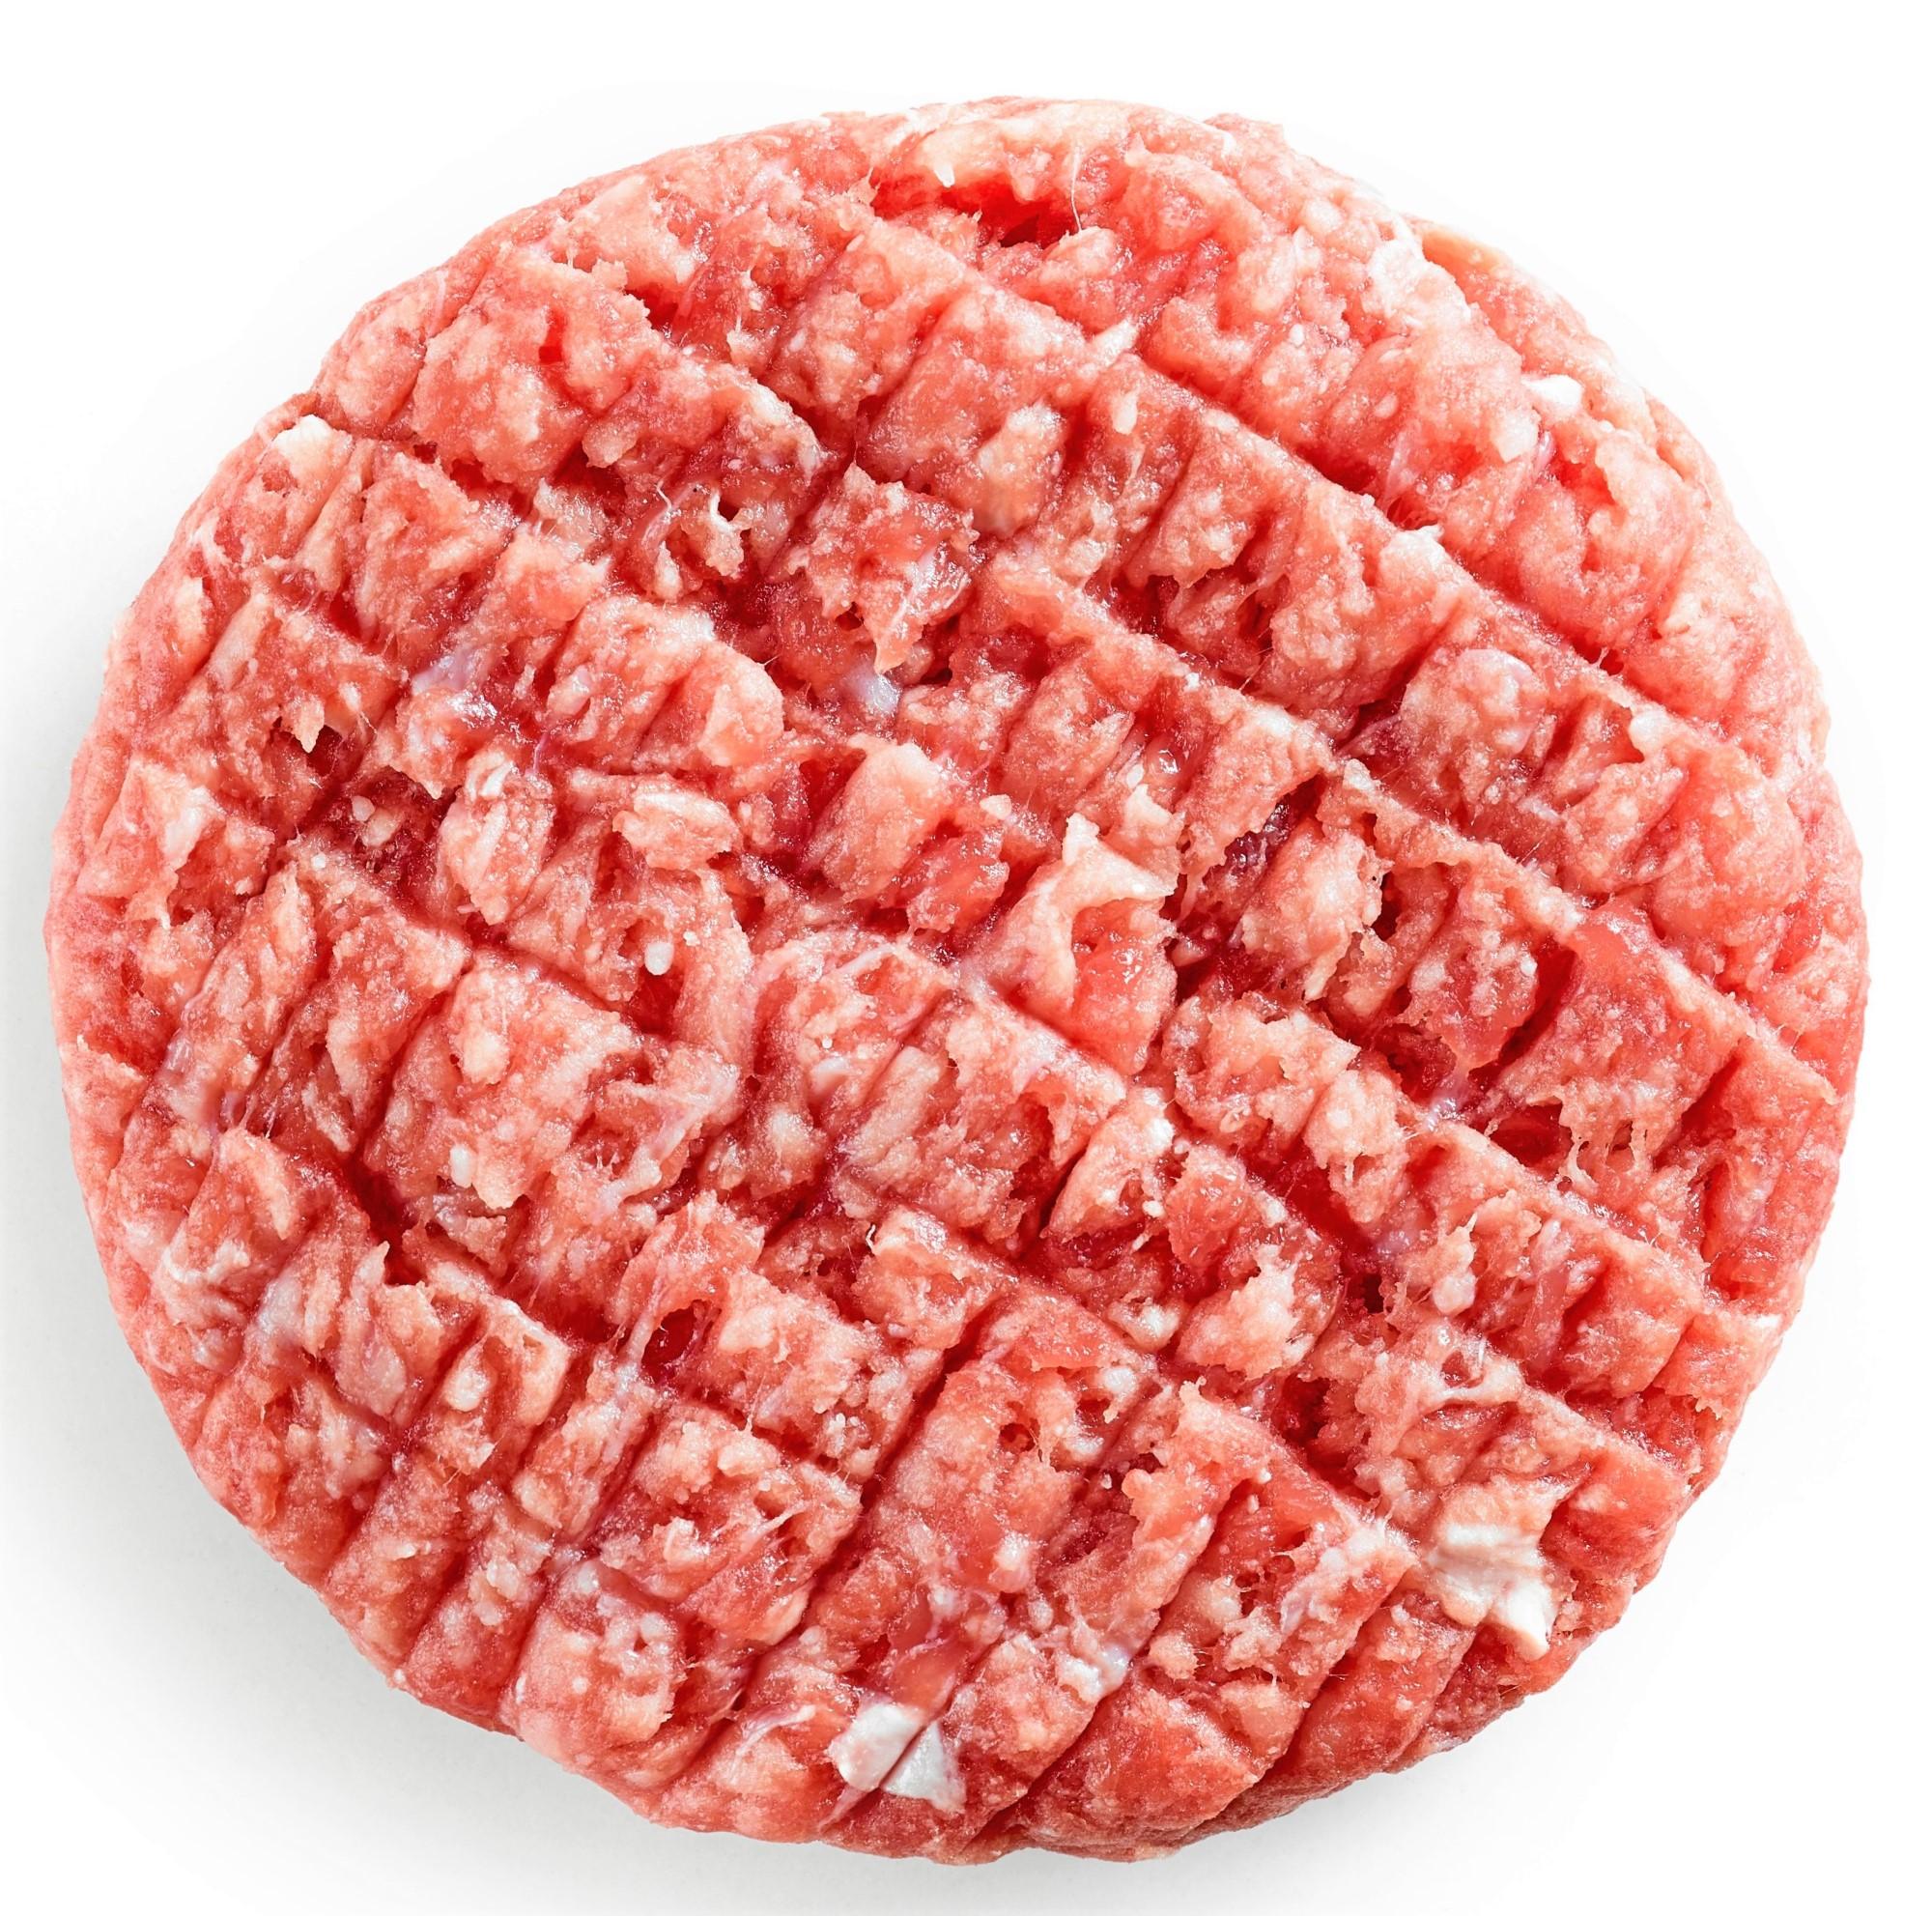 Beef Burger Image